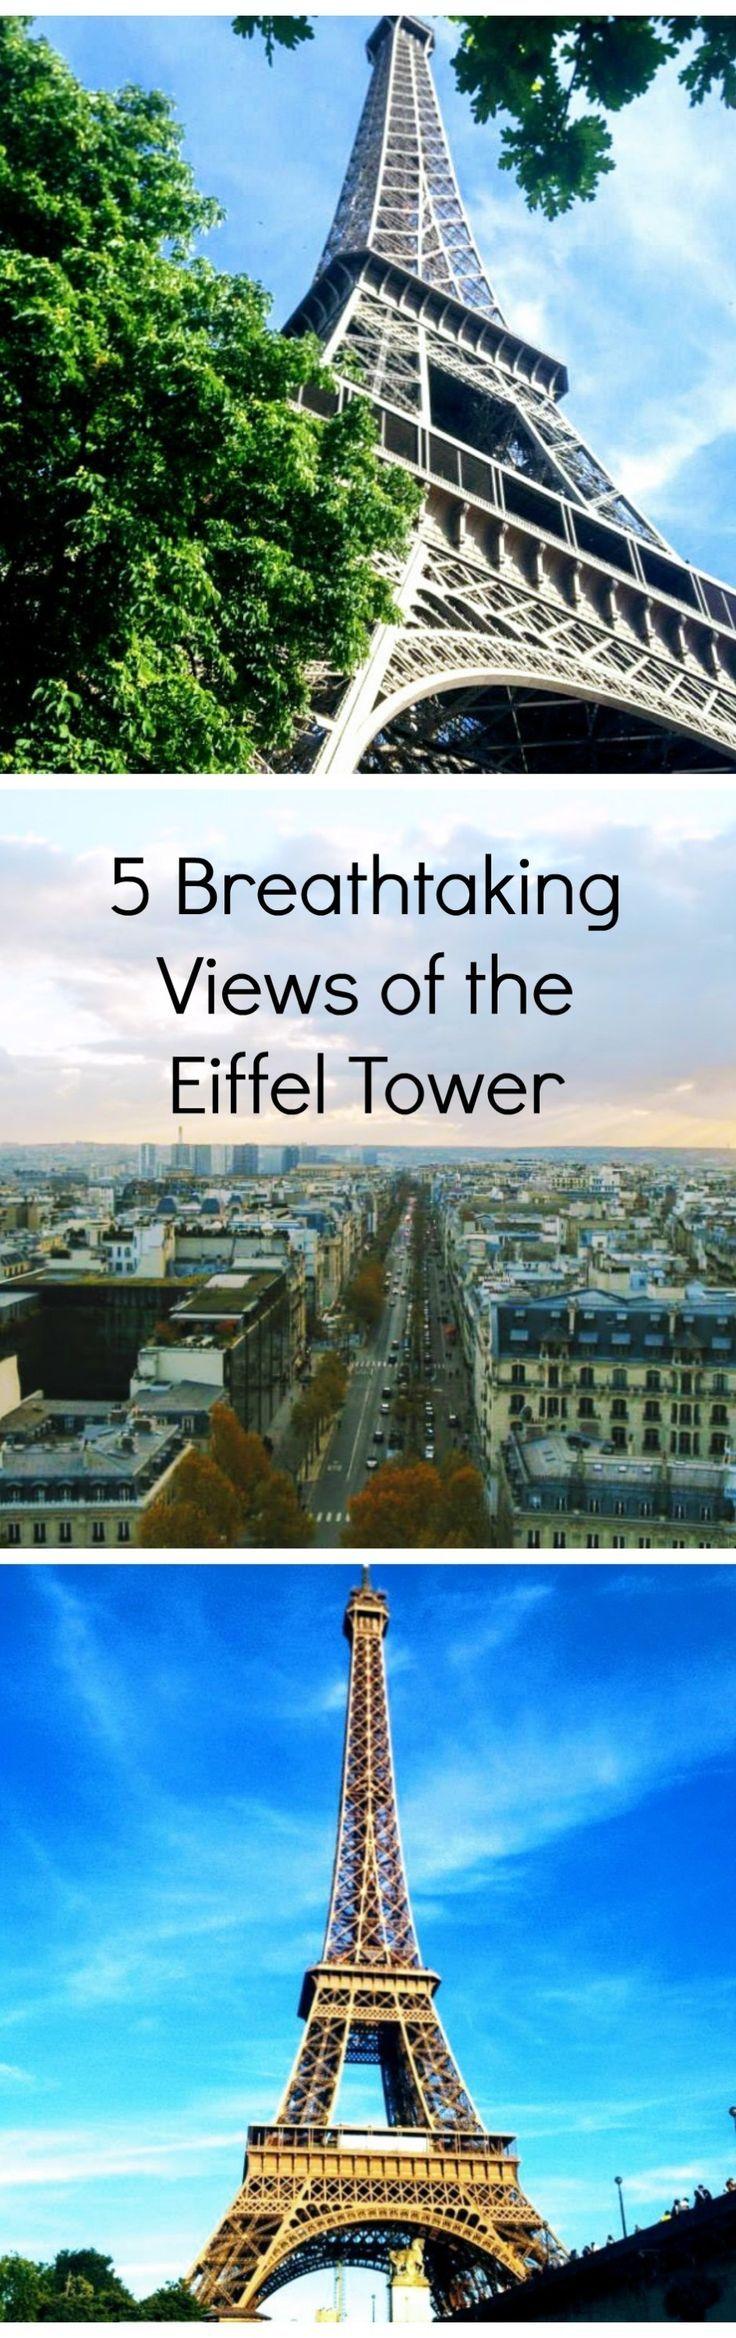 5 Breathtaking Views of the Eifeel Tower